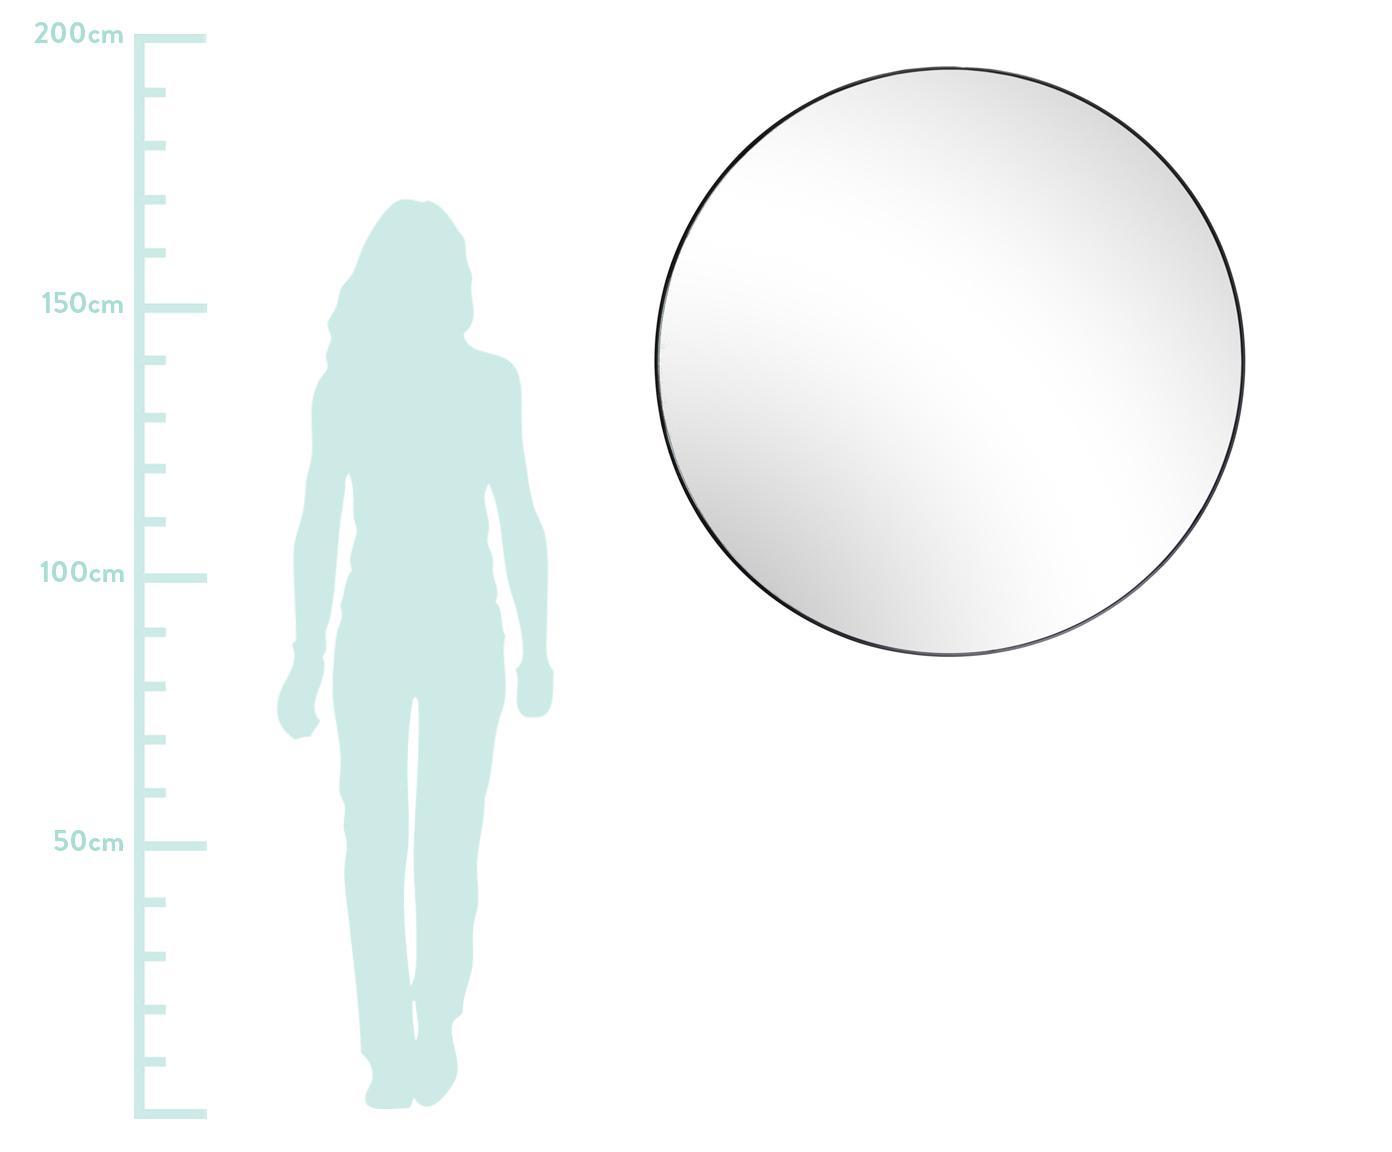 Okrągłe lustro ścienne Complete, Czarny, Ø 100 cm